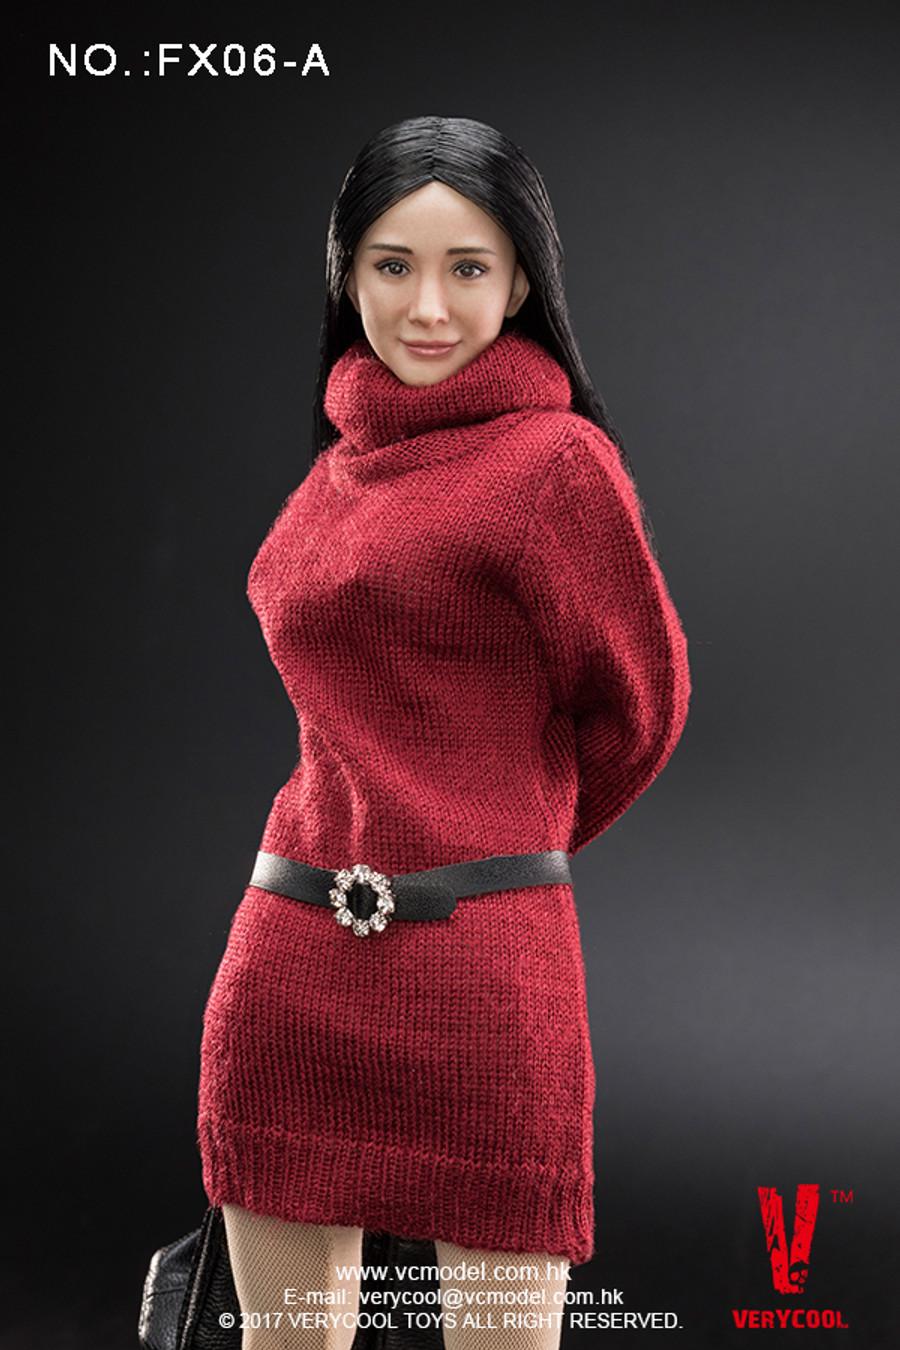 Very Cool - Asian Actress Black Straight Hair Headsculpt + VC 3.0 Female Body Set